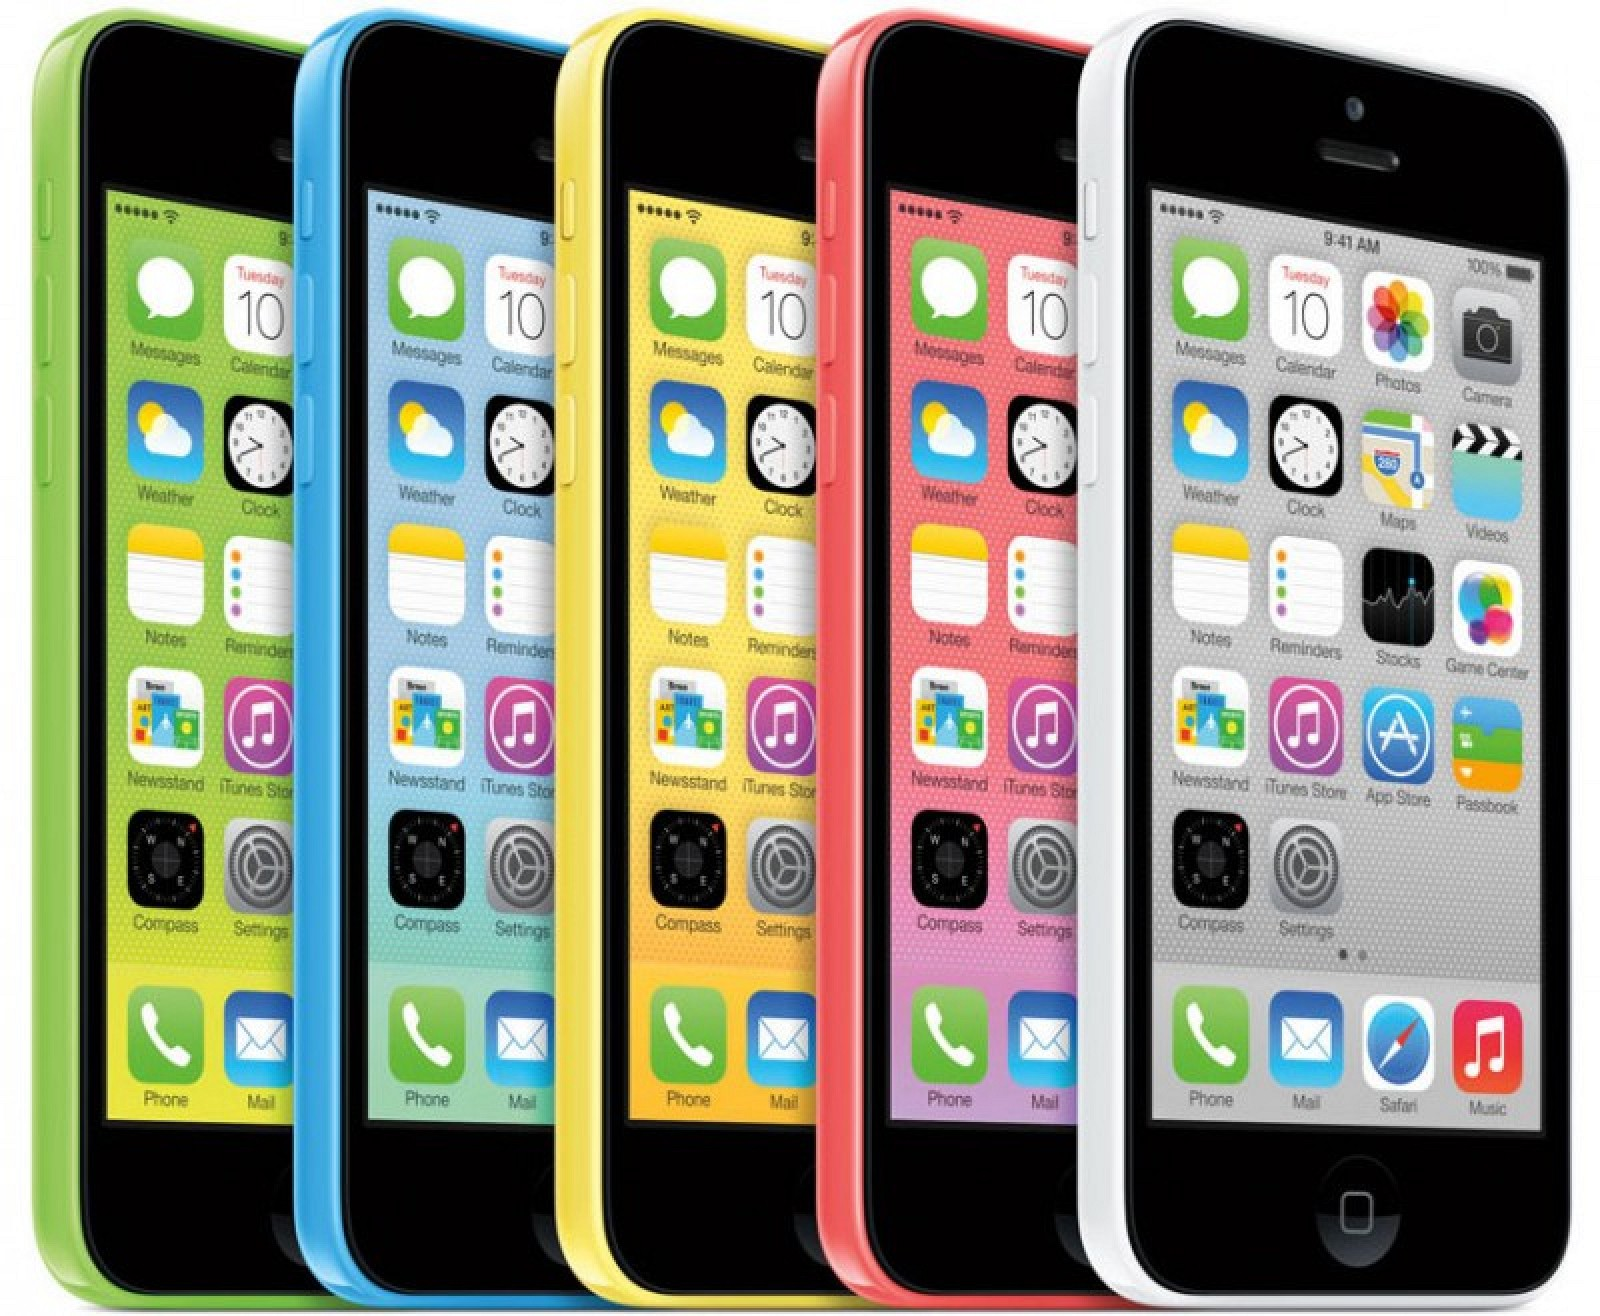 iphone5c-header-800x658.jpg